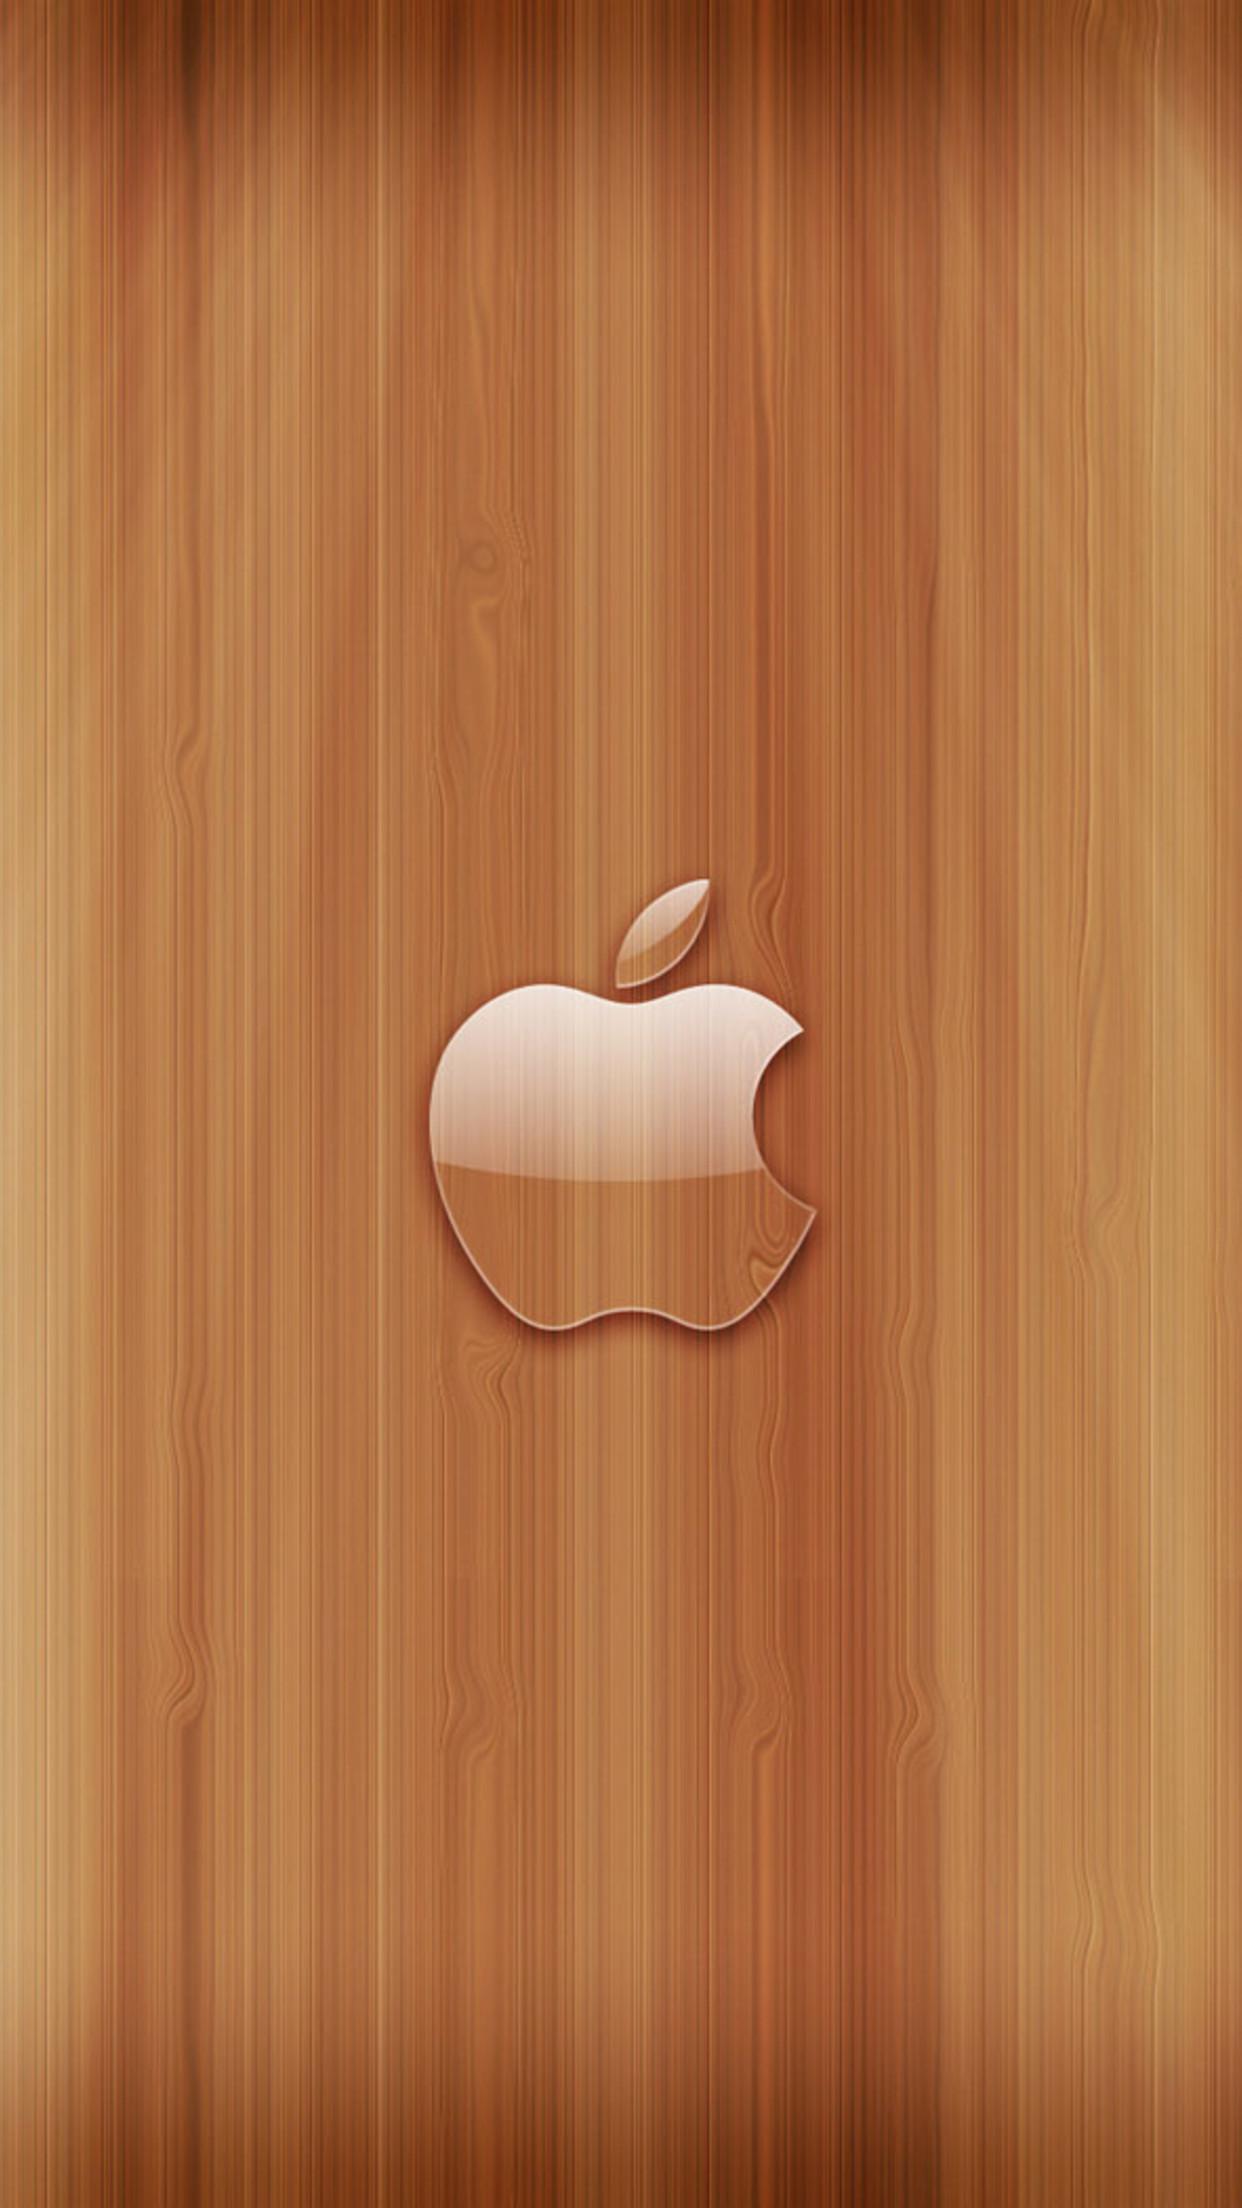 wallpaper hd iphone apple logo wood free download